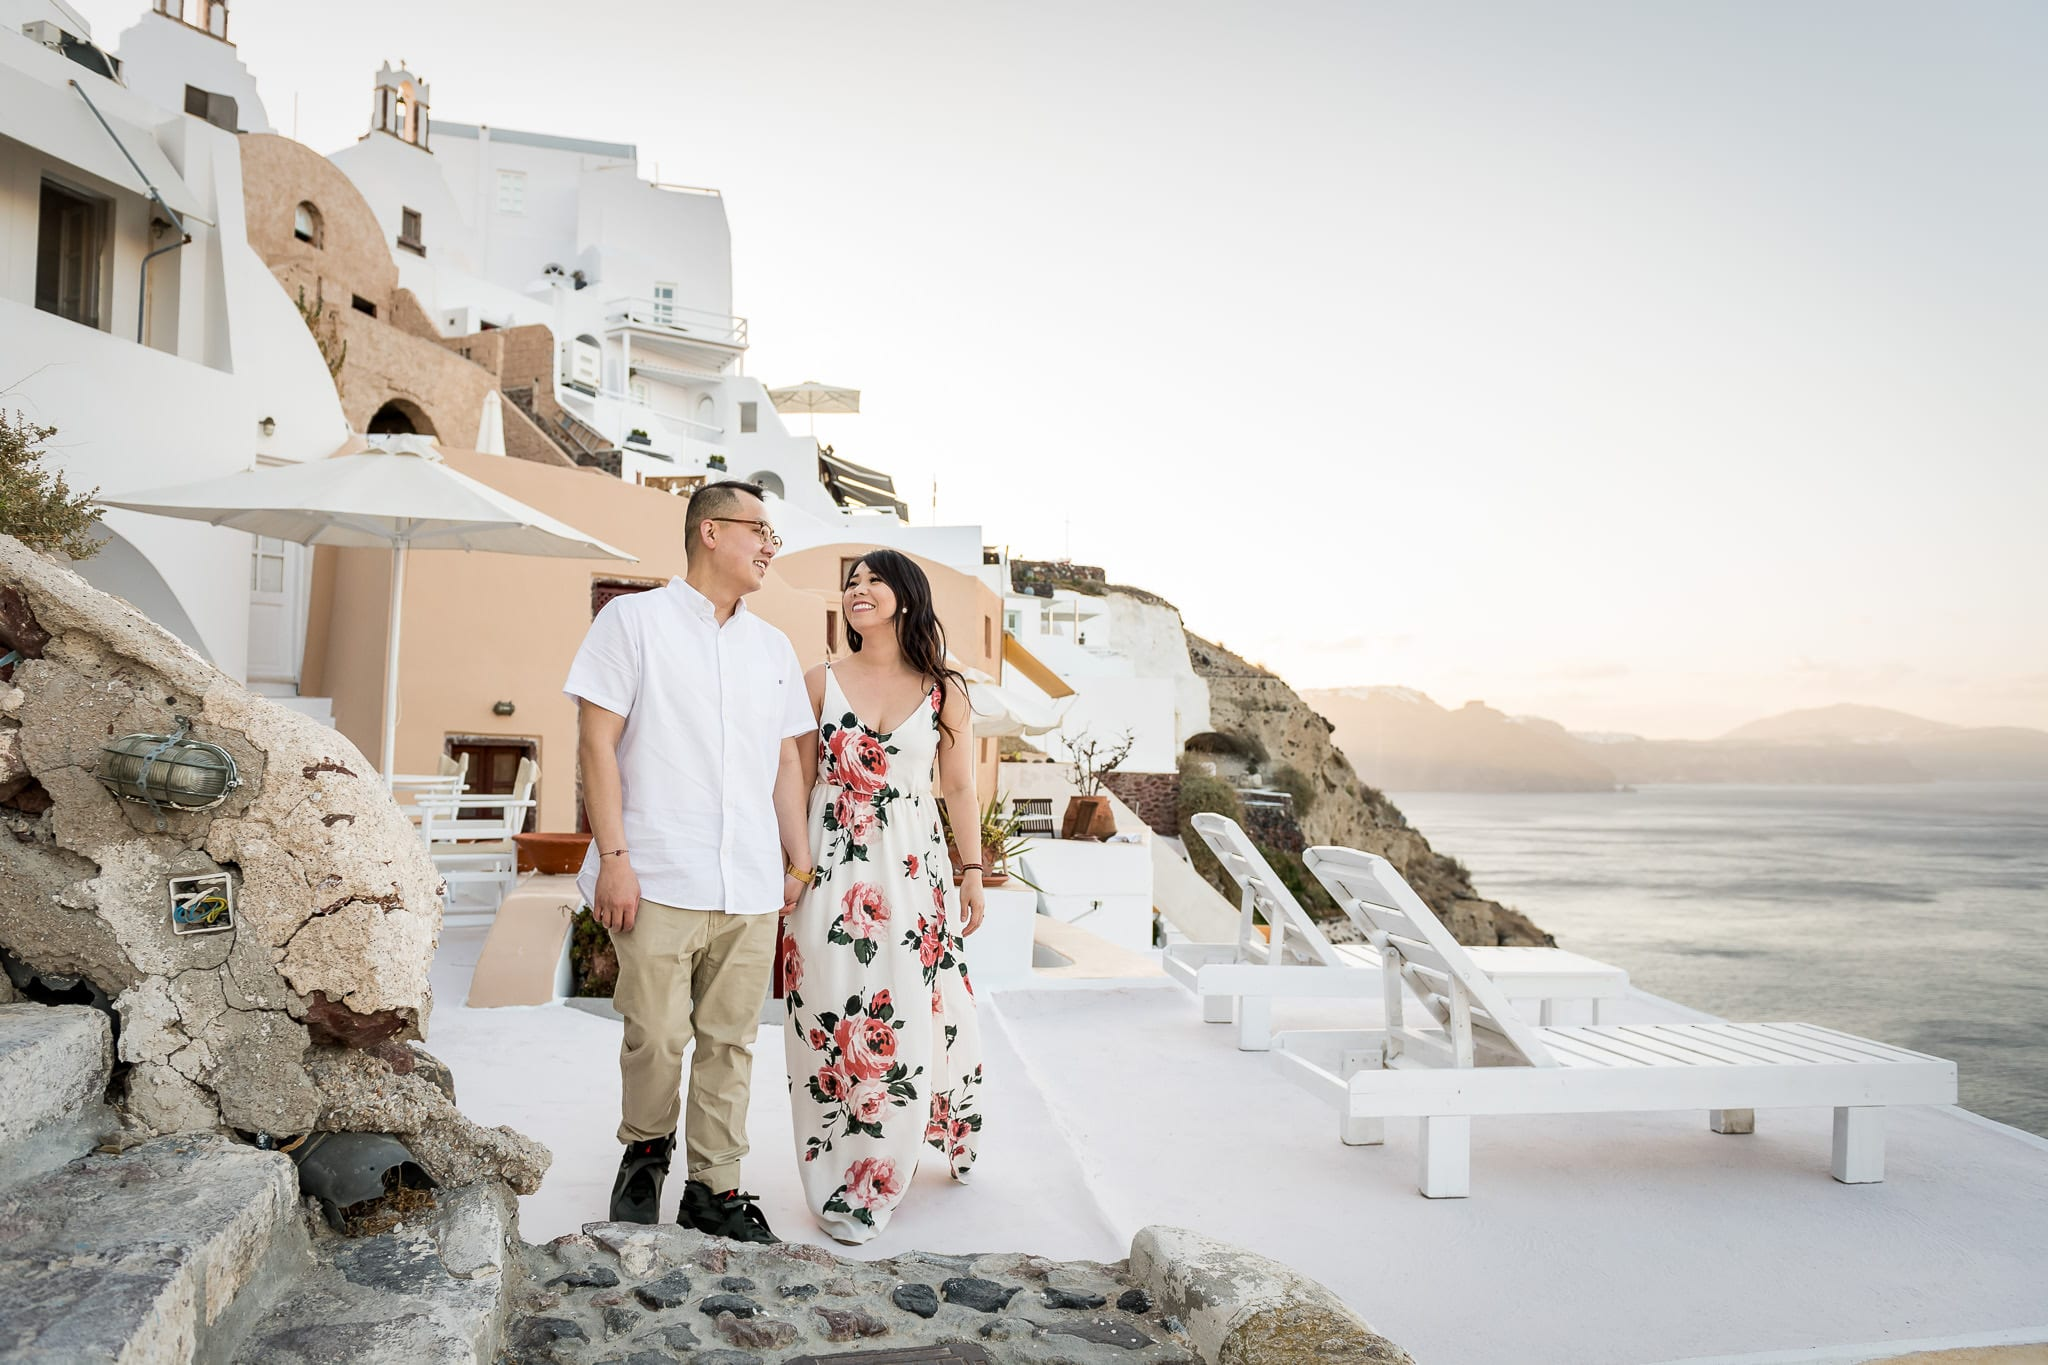 Couple holding hands on their honeymoon, overlooking the Aegean Sea at sunrise on Santorini